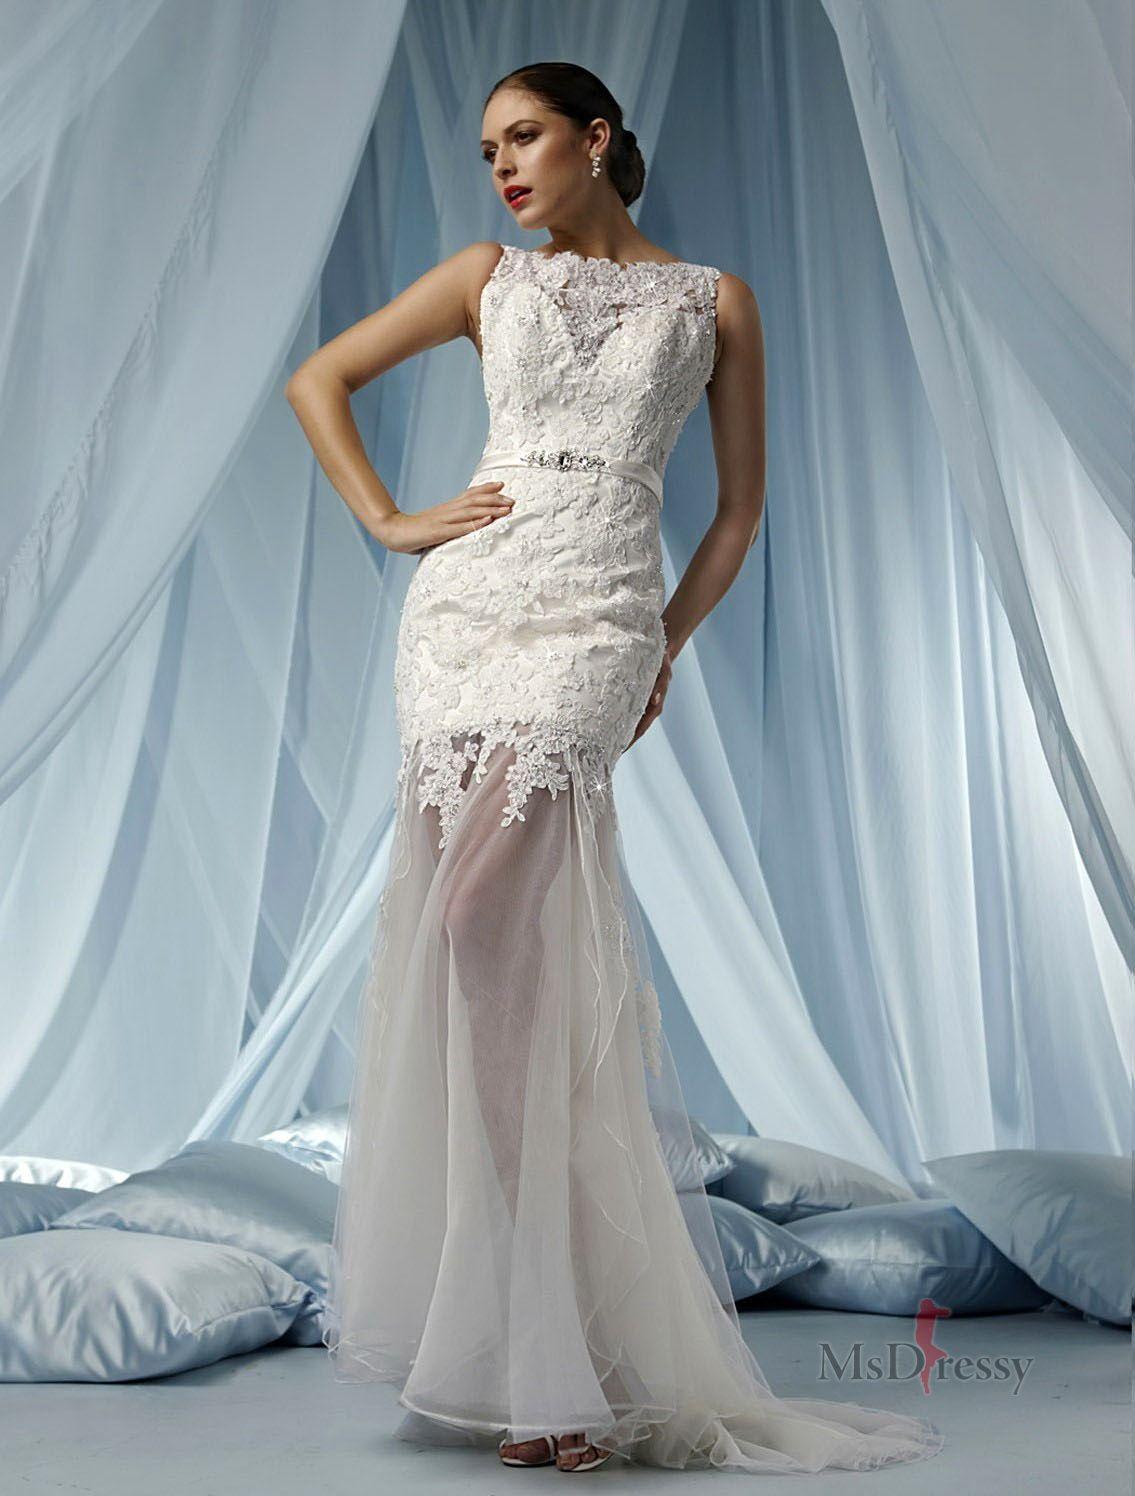 Lace Wedding Dress | WeDDiNgS | Pinterest | Lace wedding dresses ...